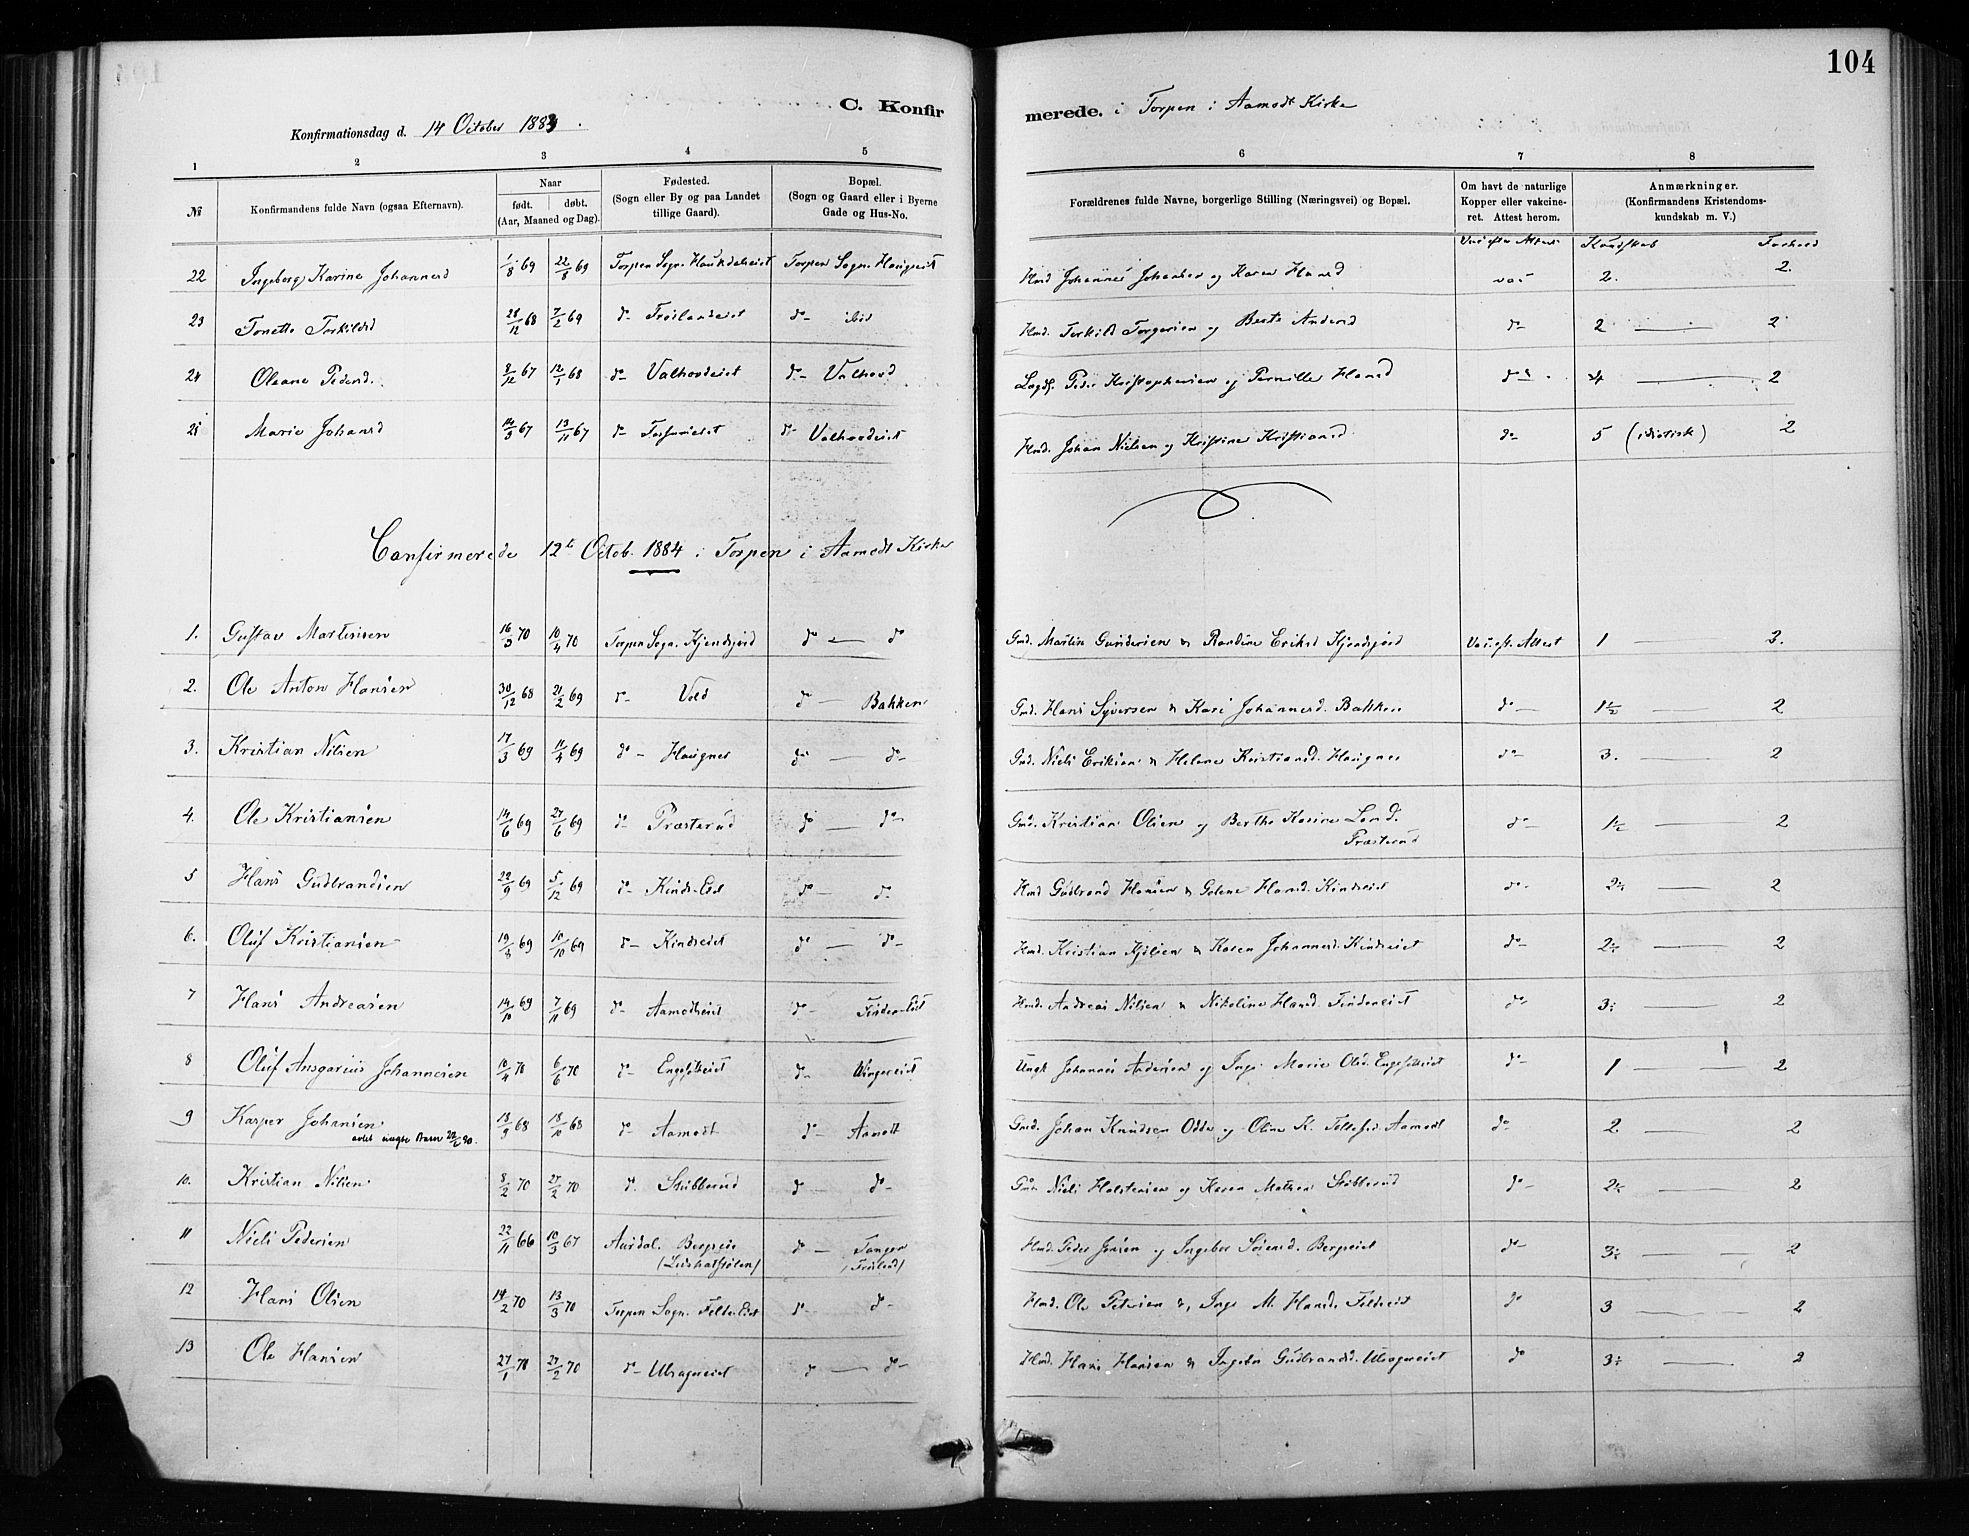 SAH, Nordre Land prestekontor, Ministerialbok nr. 4, 1882-1896, s. 104